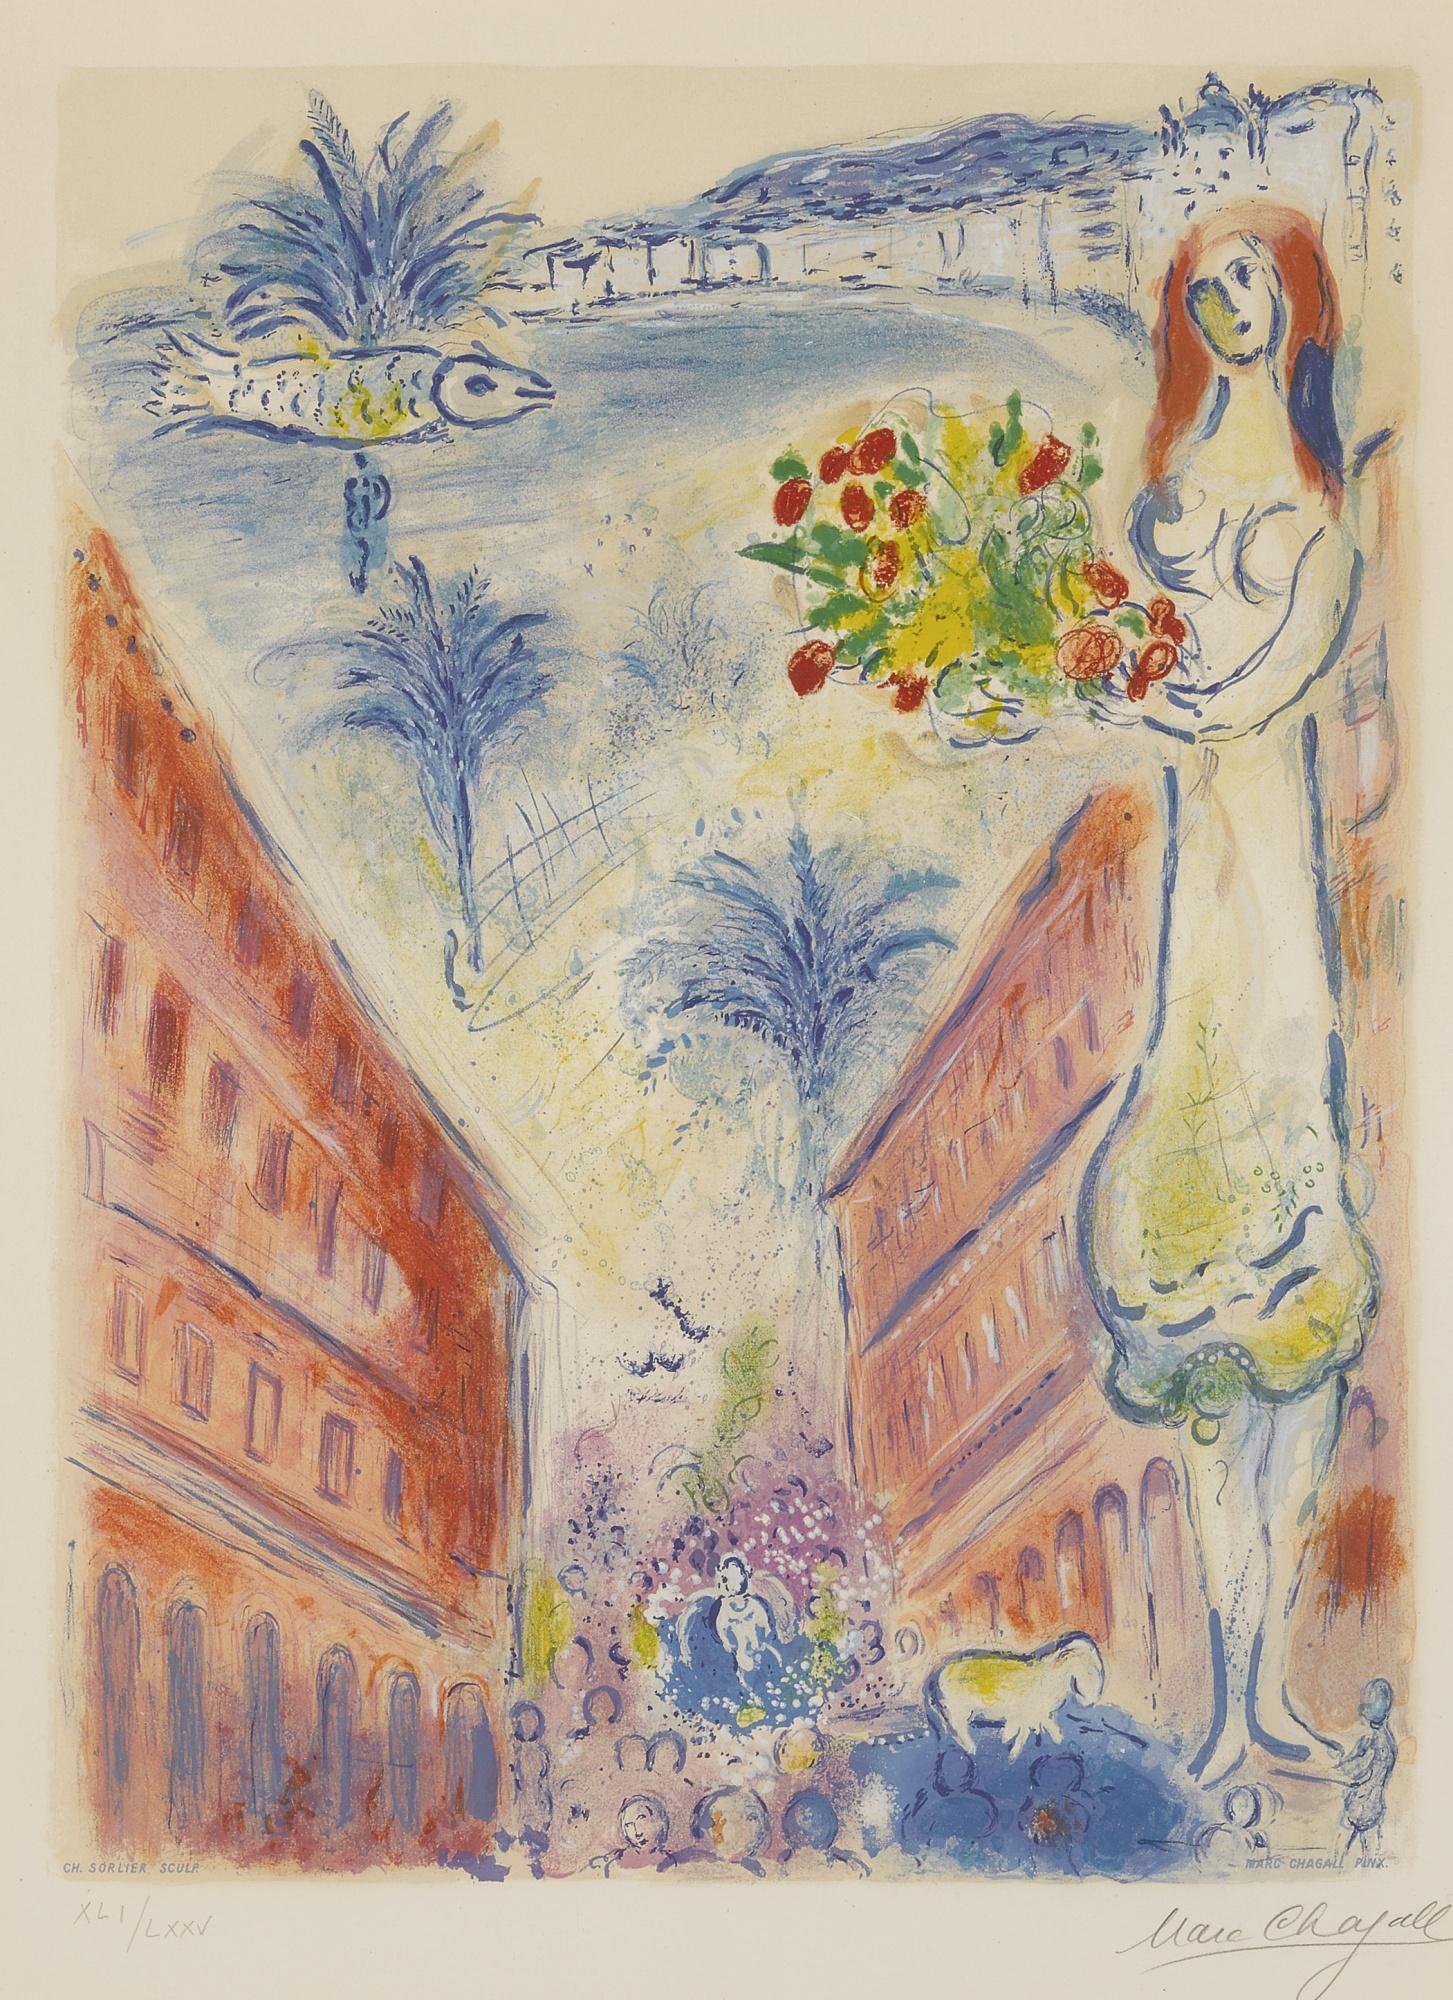 Charles Sorlier-Marc Chagall-Charles Sorlier After Marc Chagall - Avenue De La Victoire A Nice (M. Cs 31)-1967